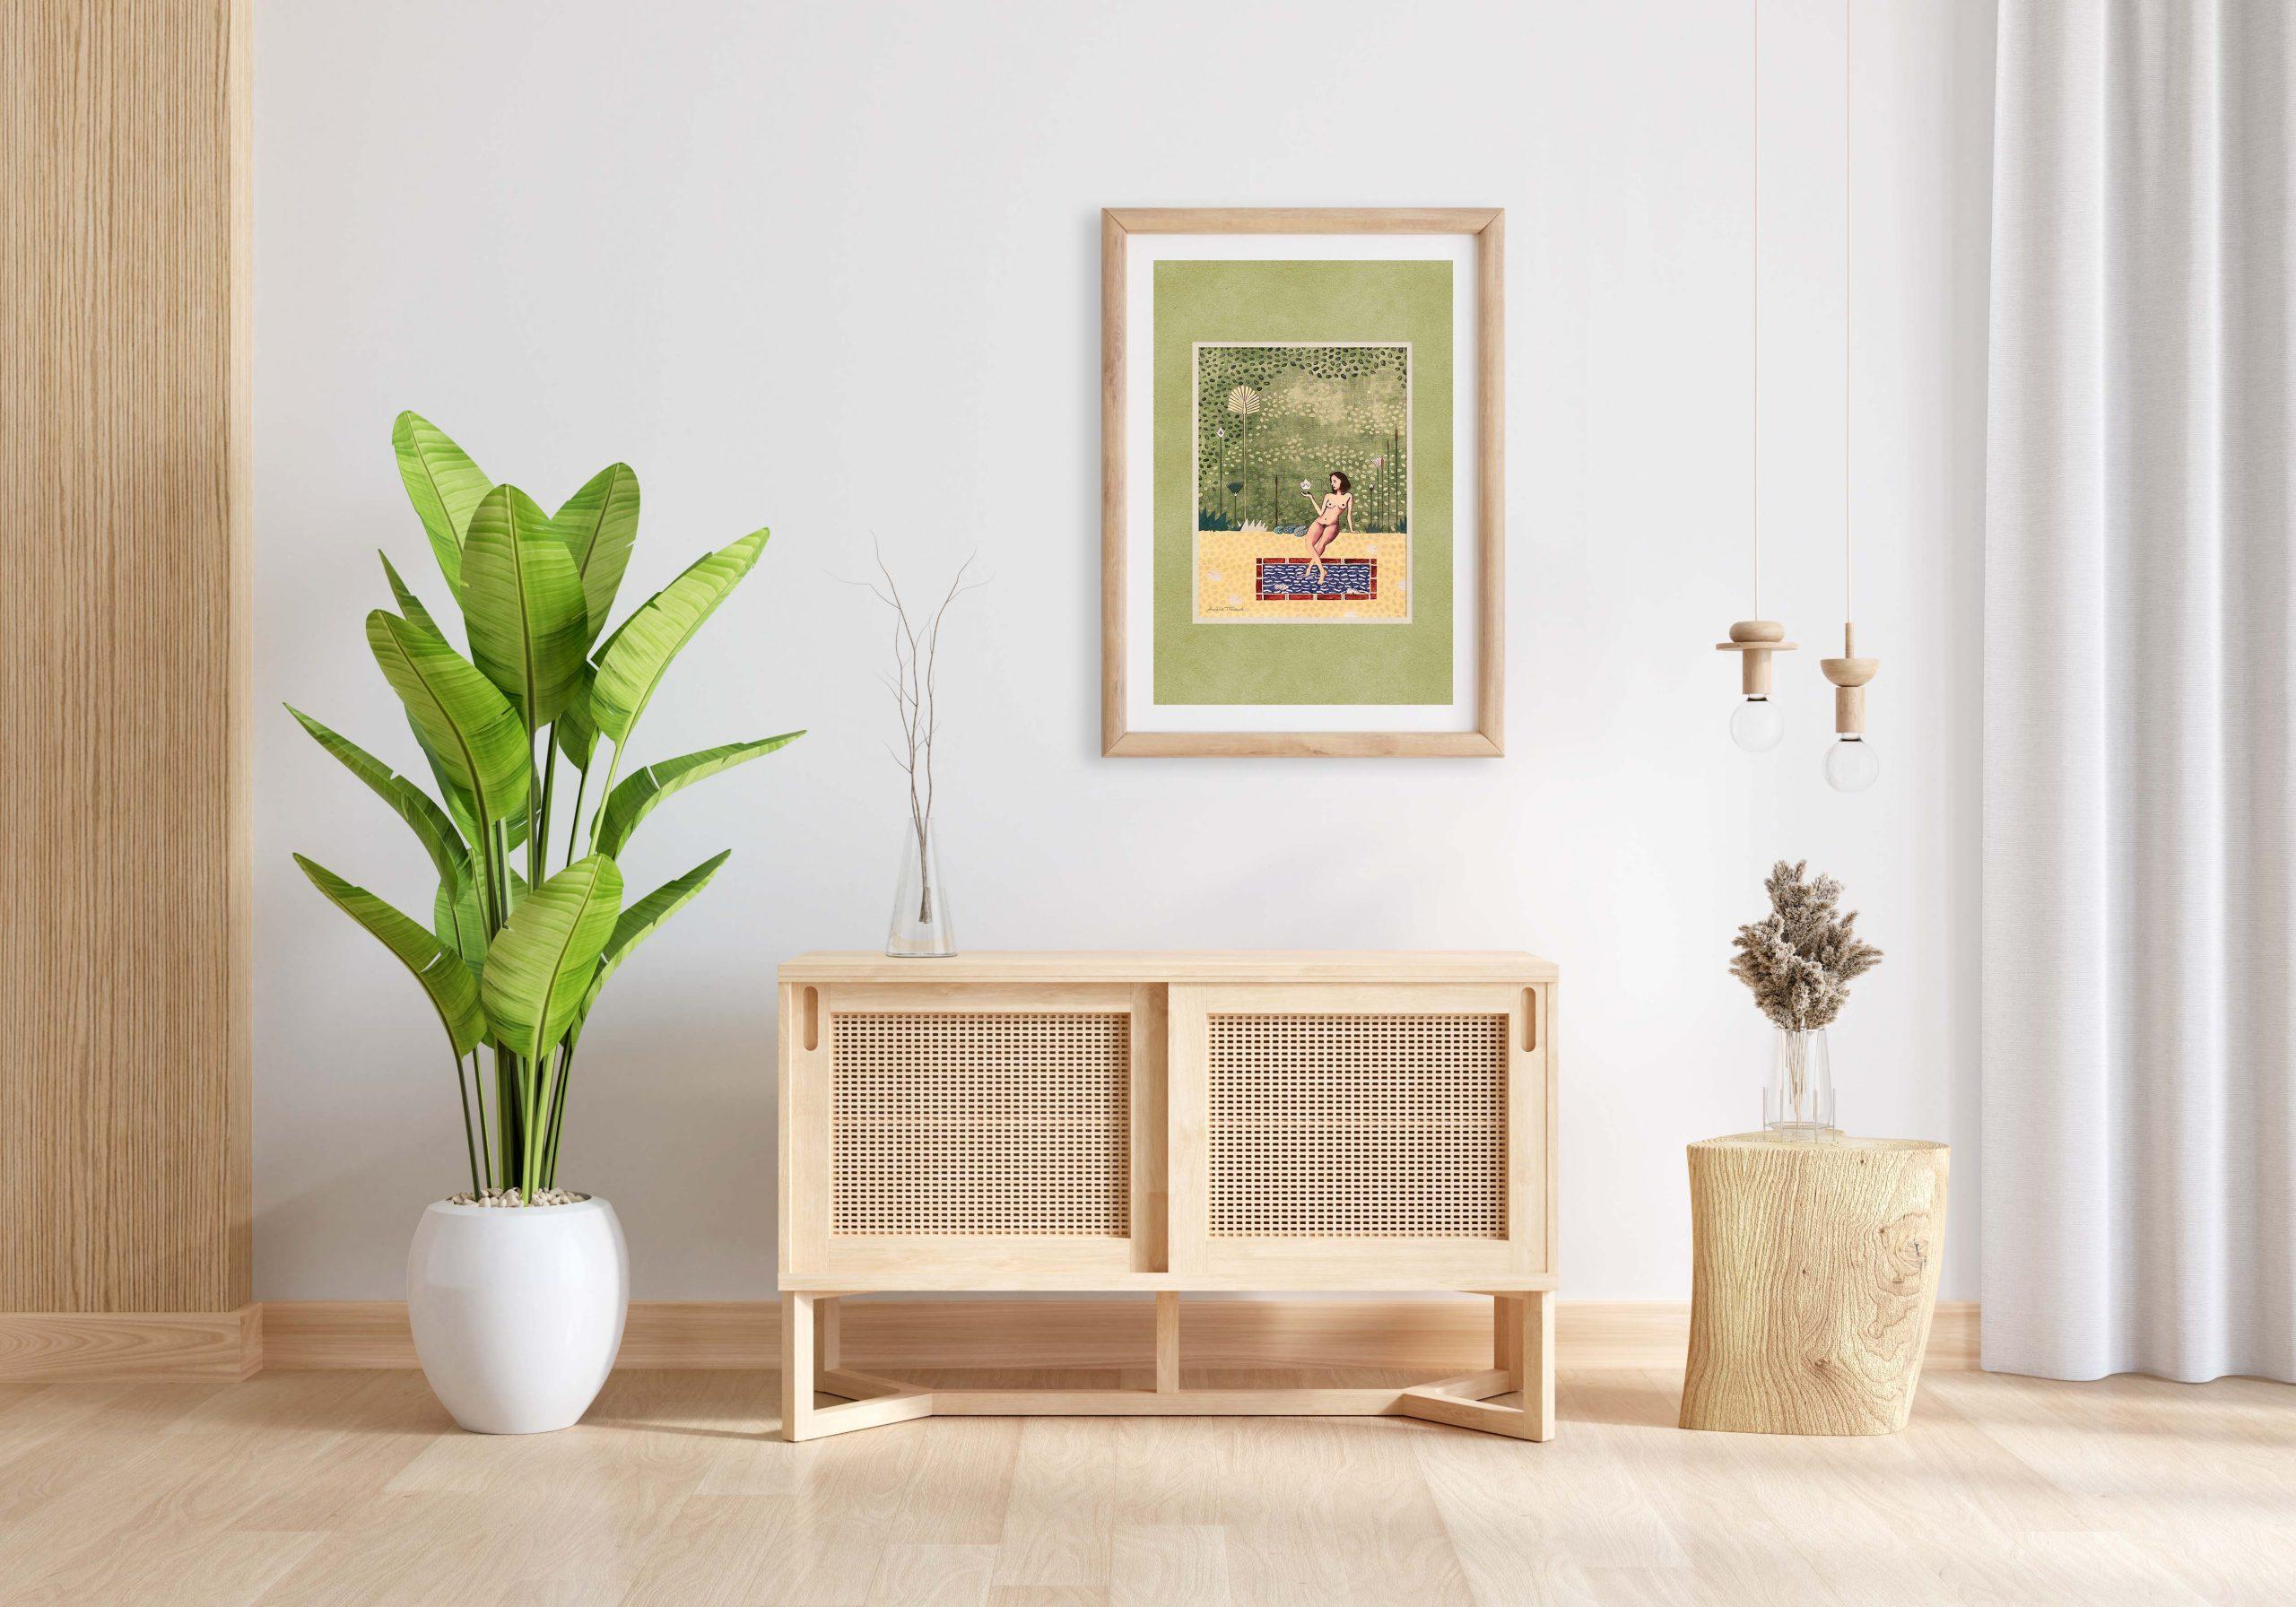 Wood sideboard in living room with frame mockup, 3D rendering